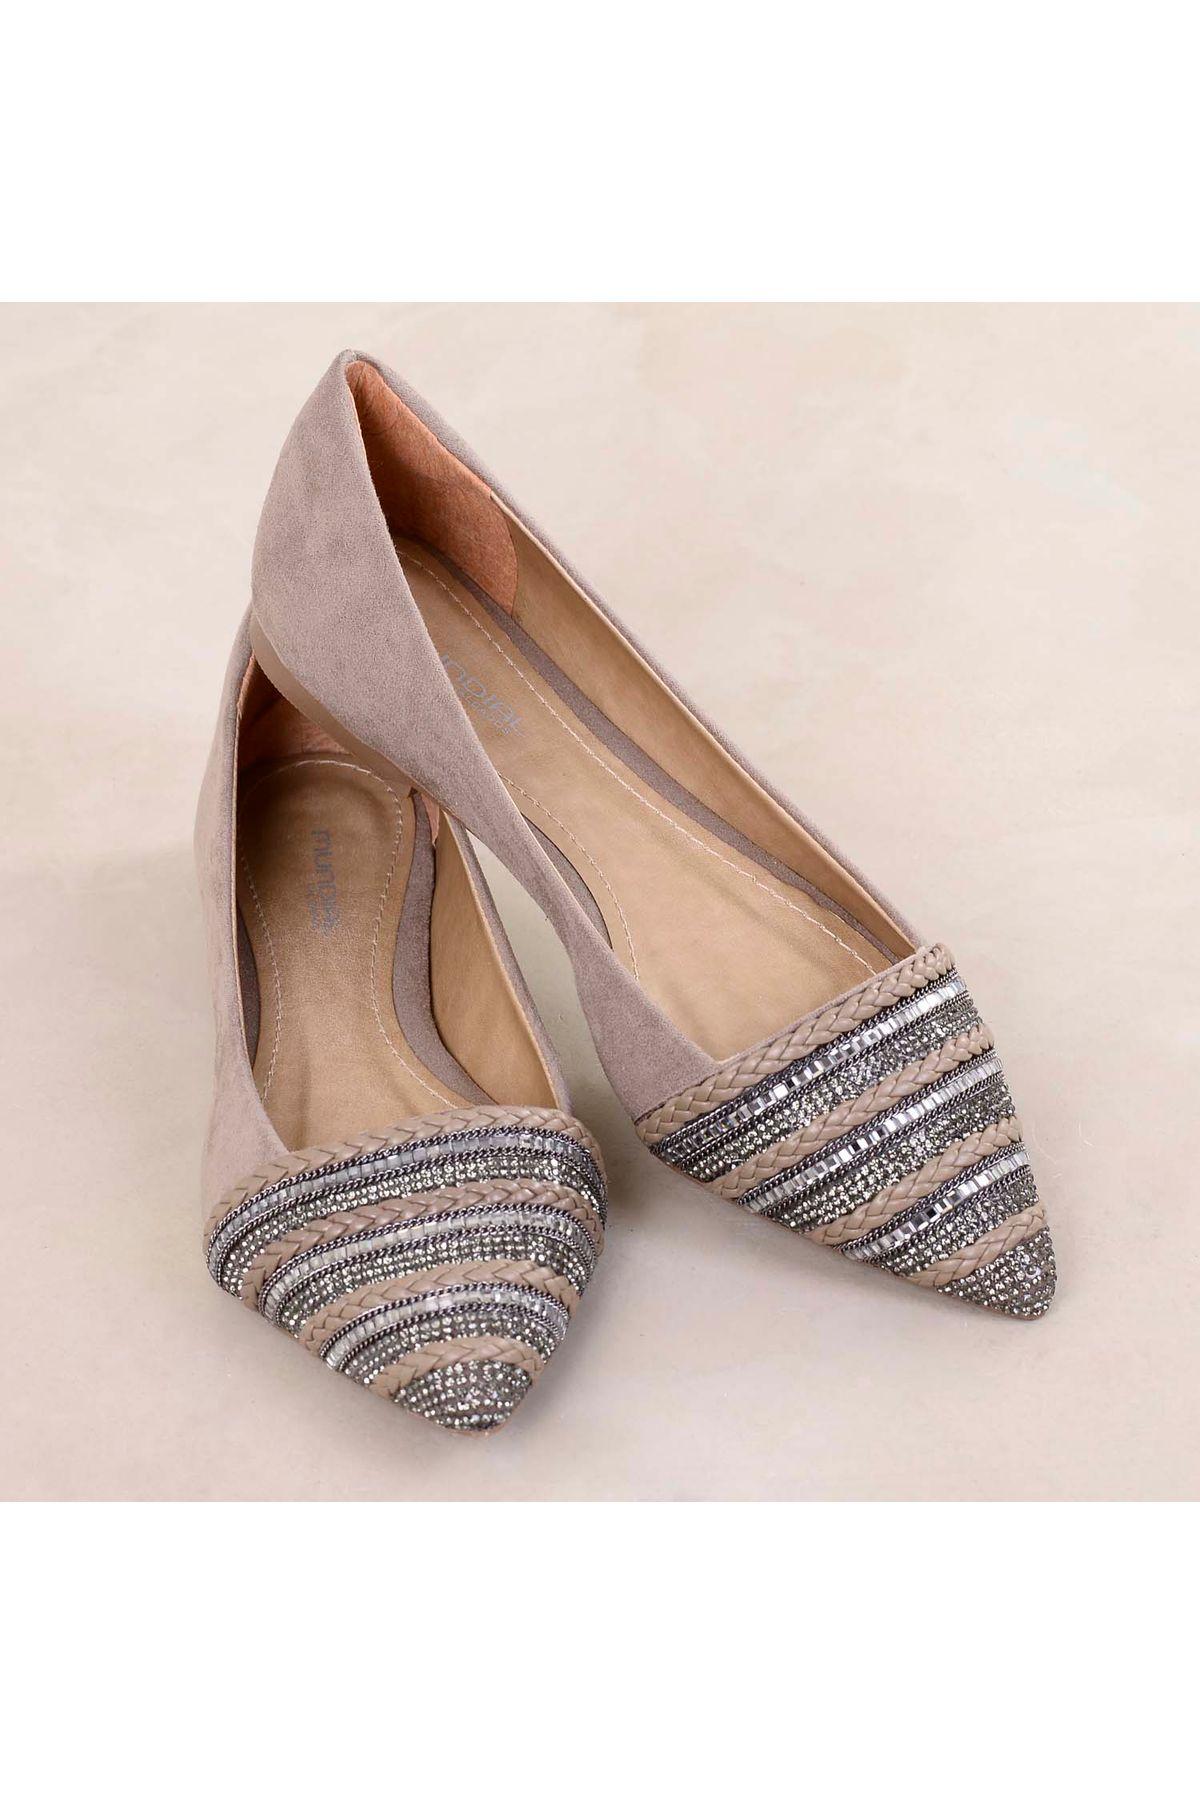 49f5aa0d1 Sapatilha Feminina Tity Mundial | Mundial Calçados - Mundial Calçados